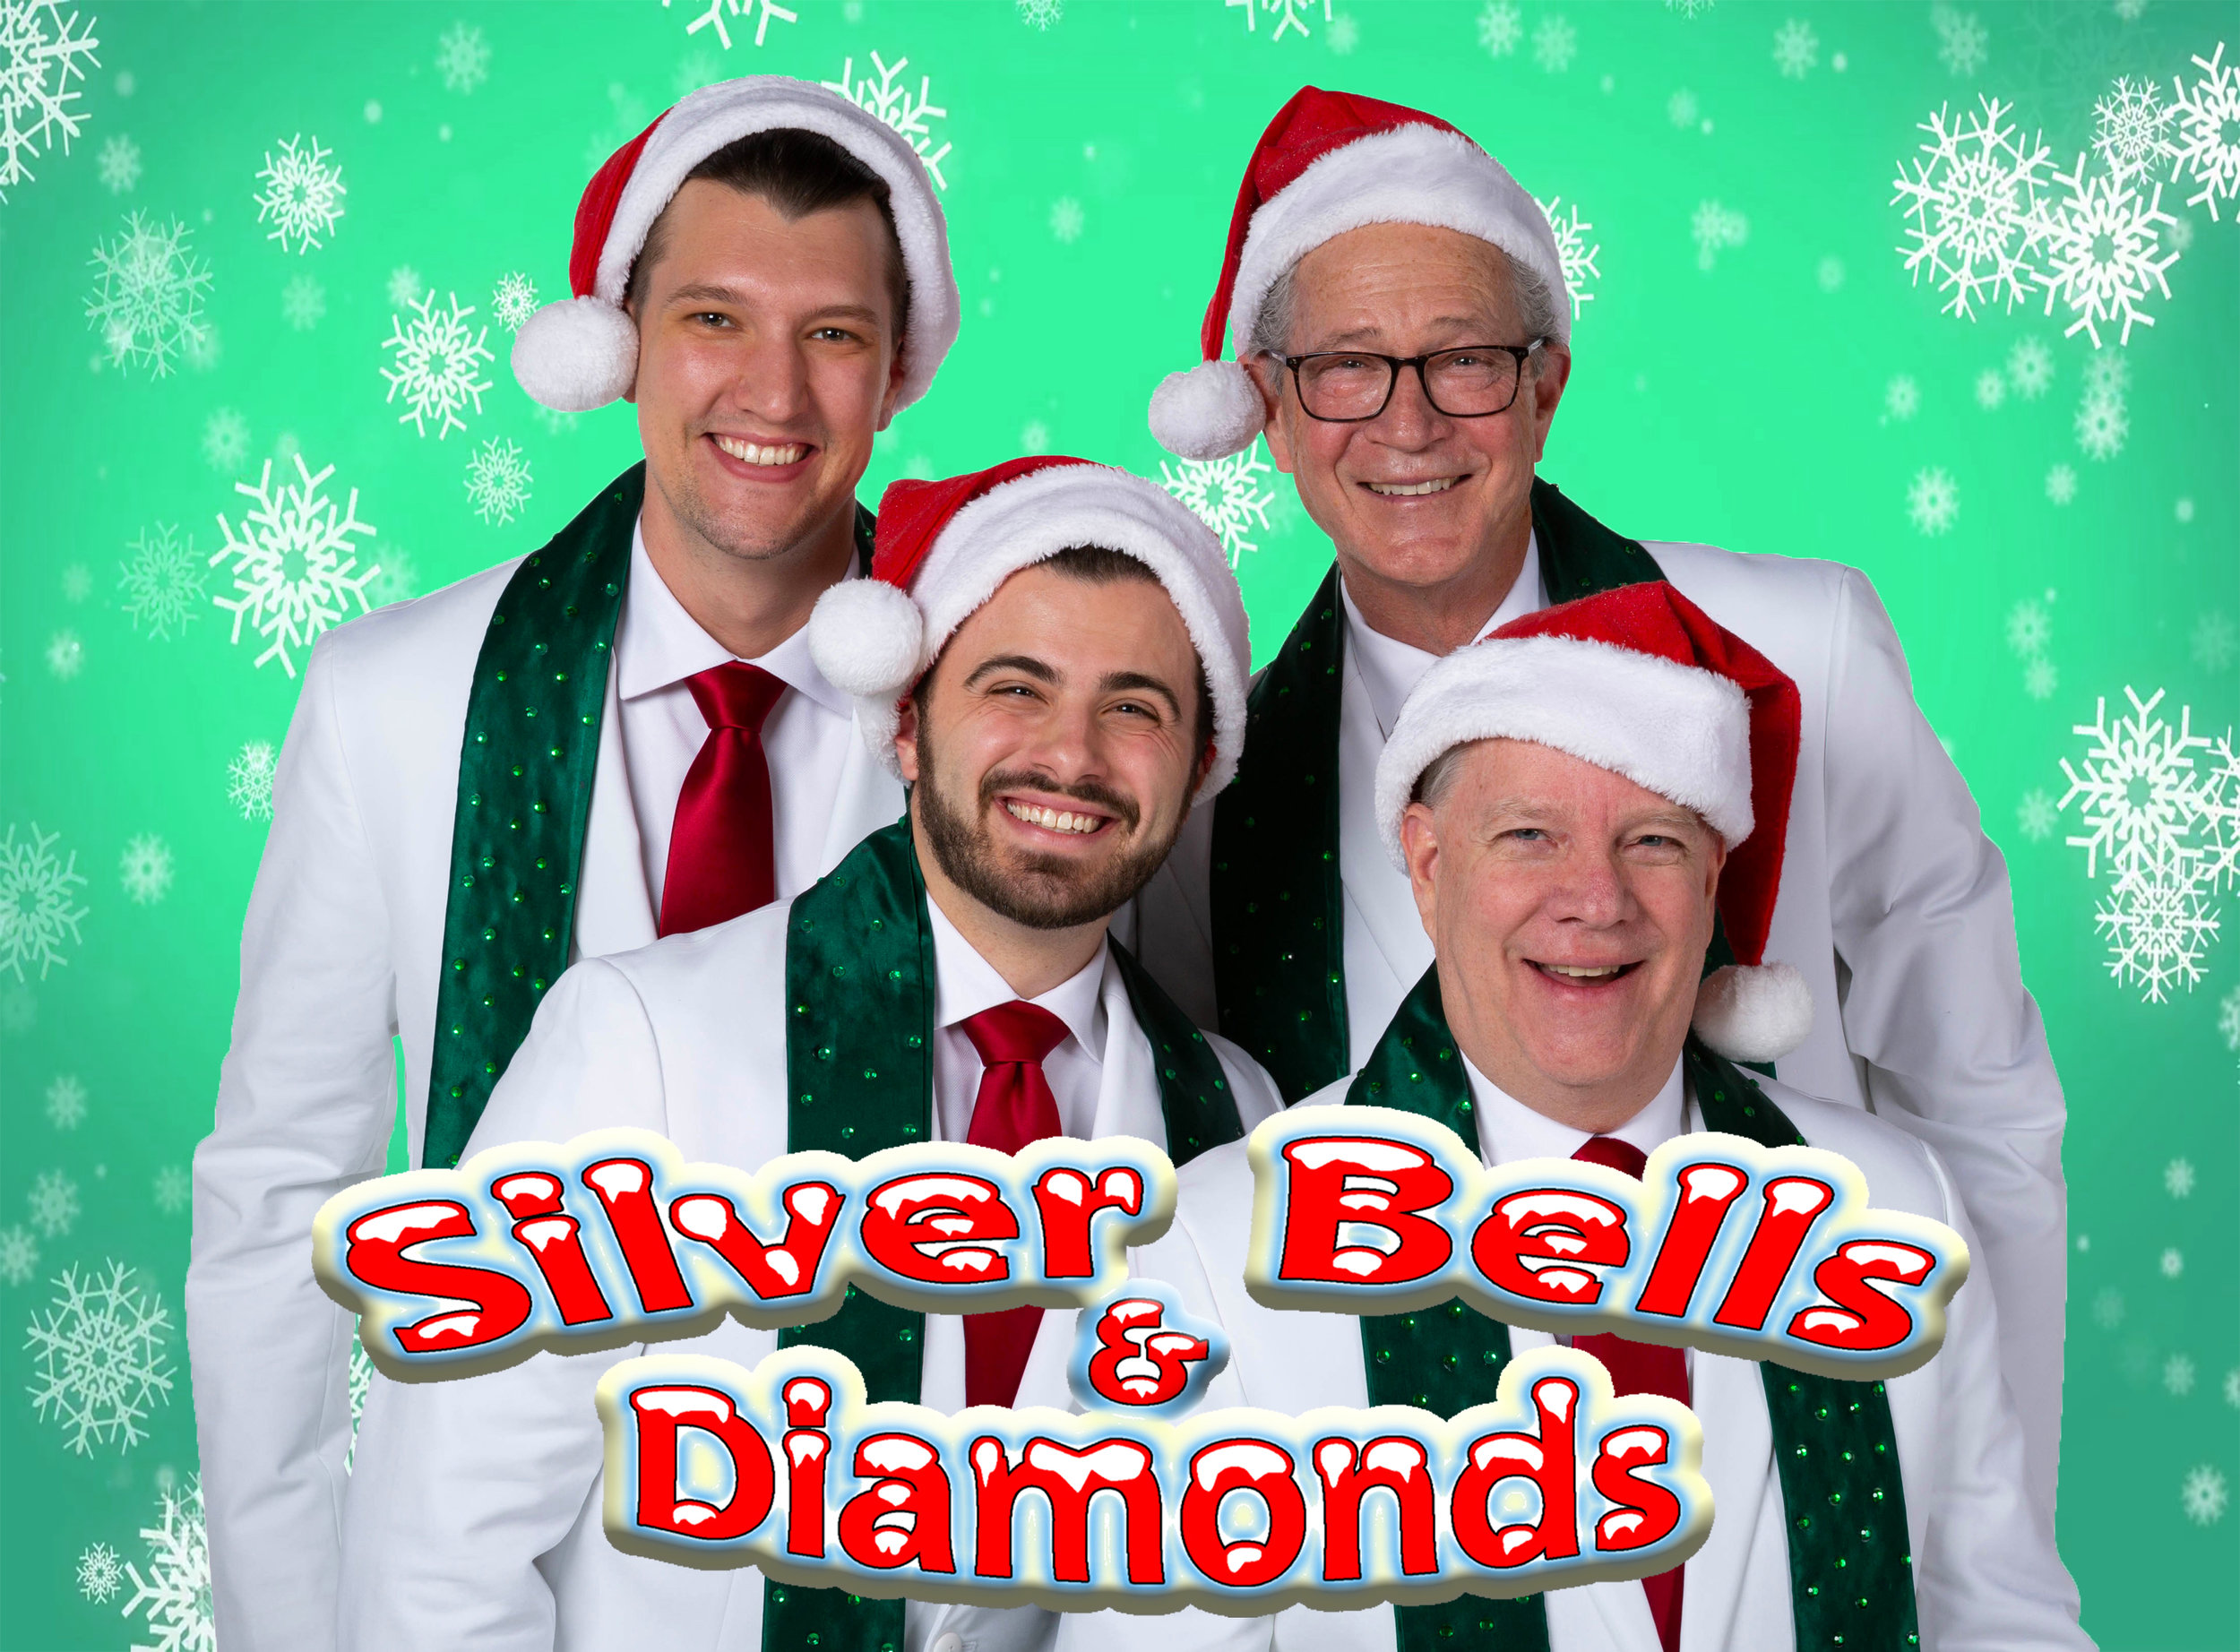 023 SilverBells&Diamonds.jpg